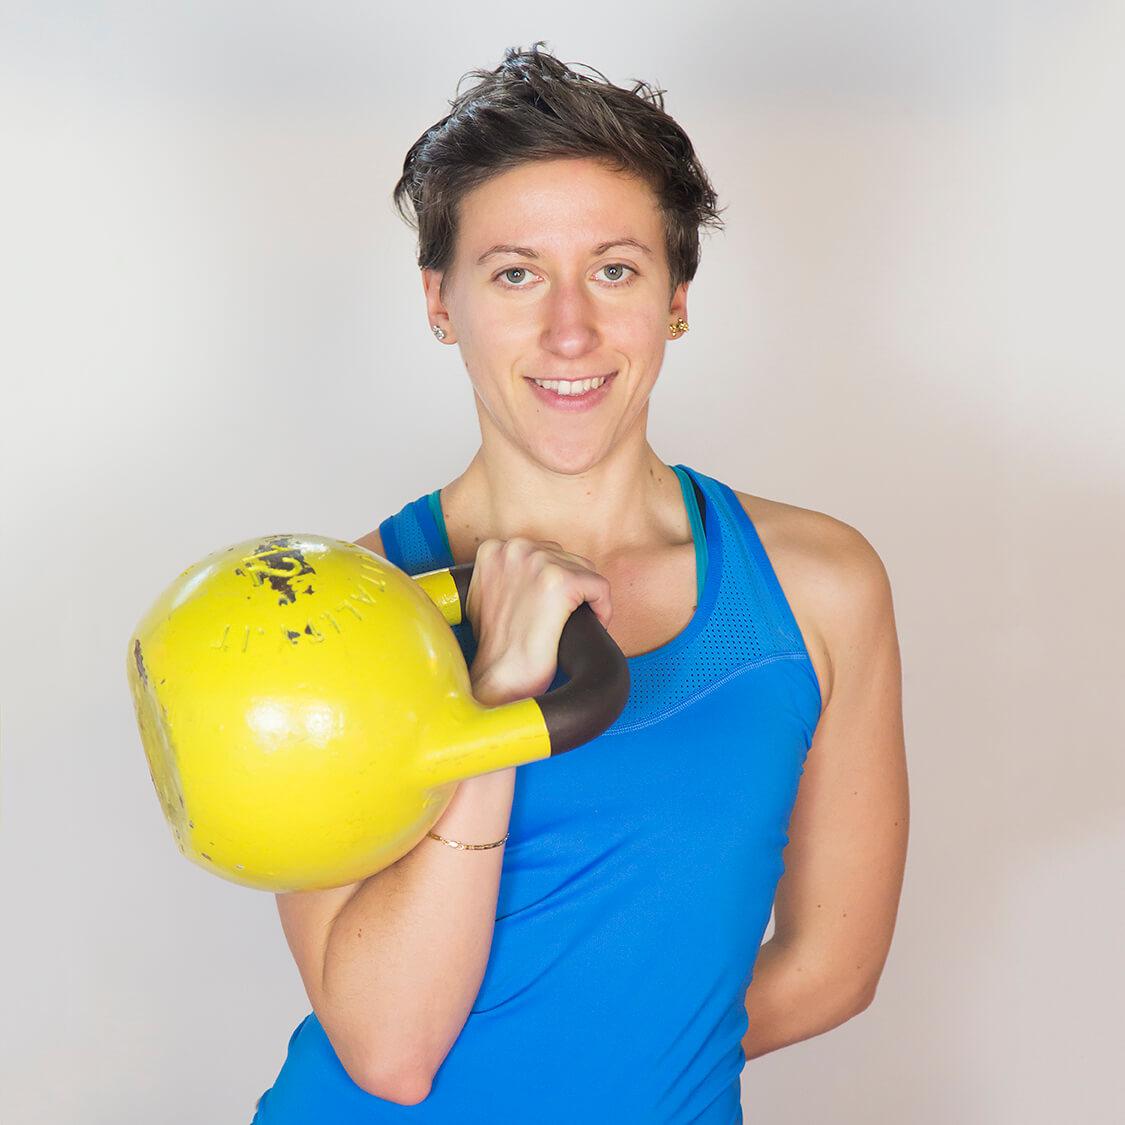 Amanda Morani